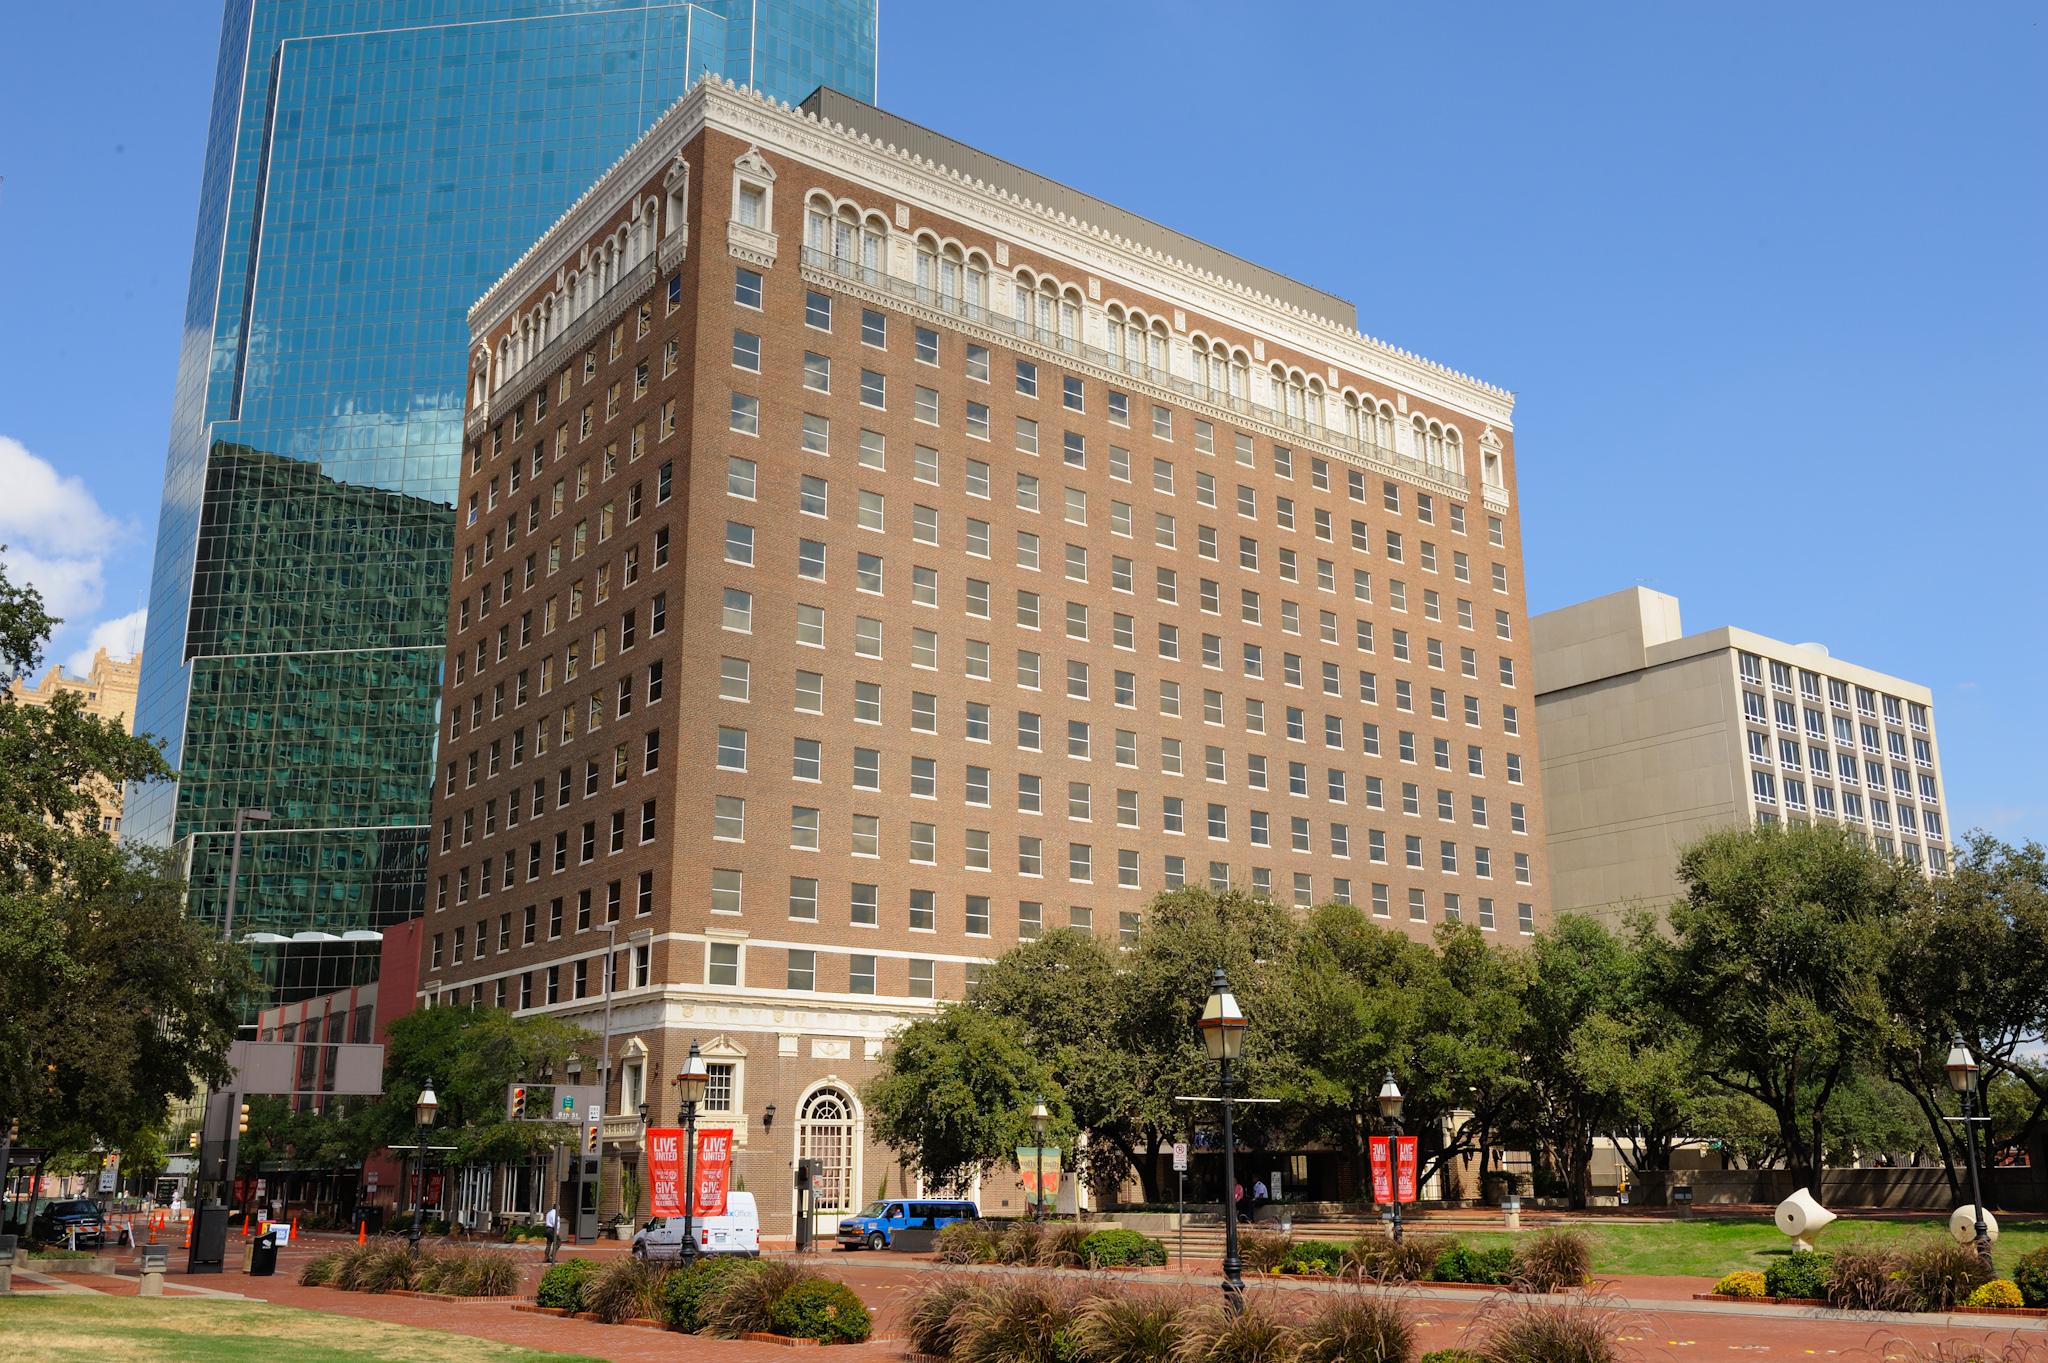 Hilton Hotels Fort Lauderdale Near Cruise Port